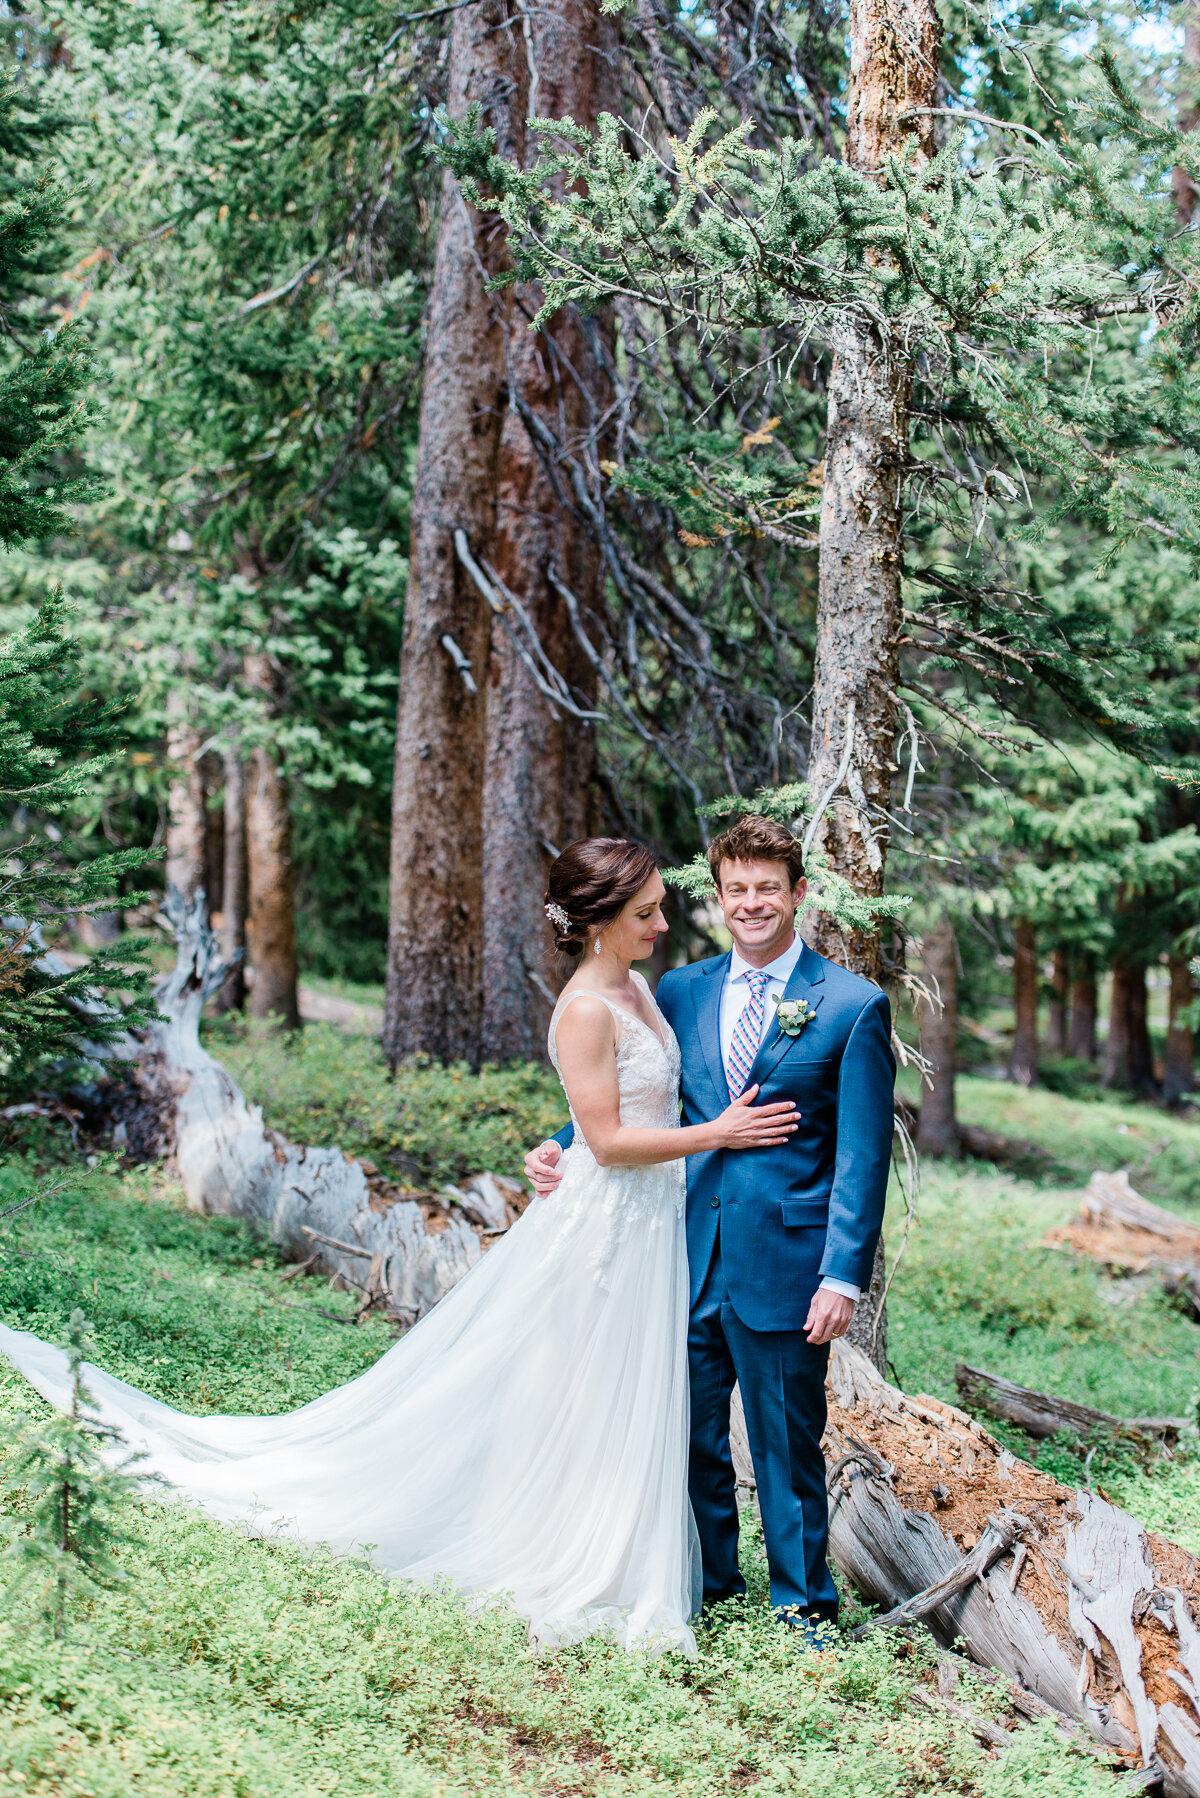 AshleighMillerPhotography-Wedding-Natalia-Matt-ArapahoeBasin-Colorado-15.jpg